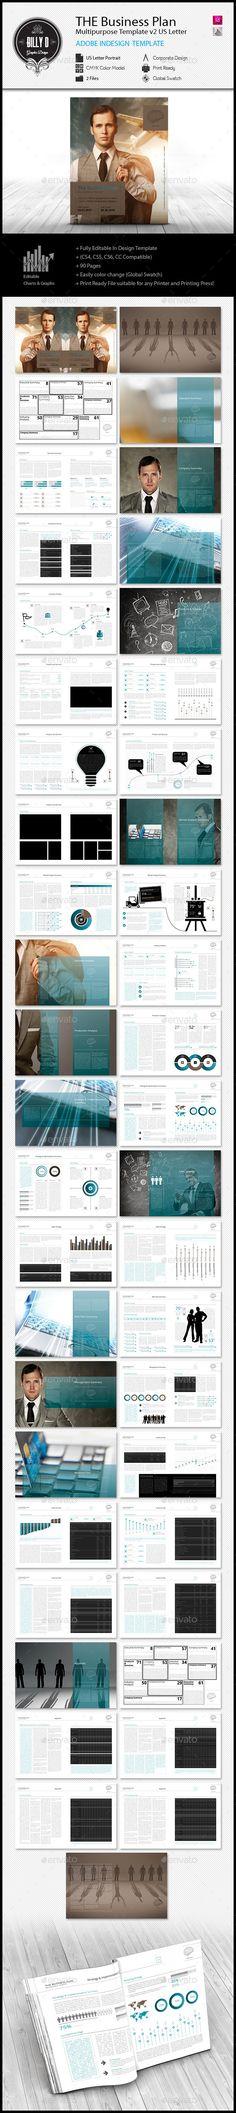 A3 Balance Sheet Template A standard company balance sheet has - company balance sheet template